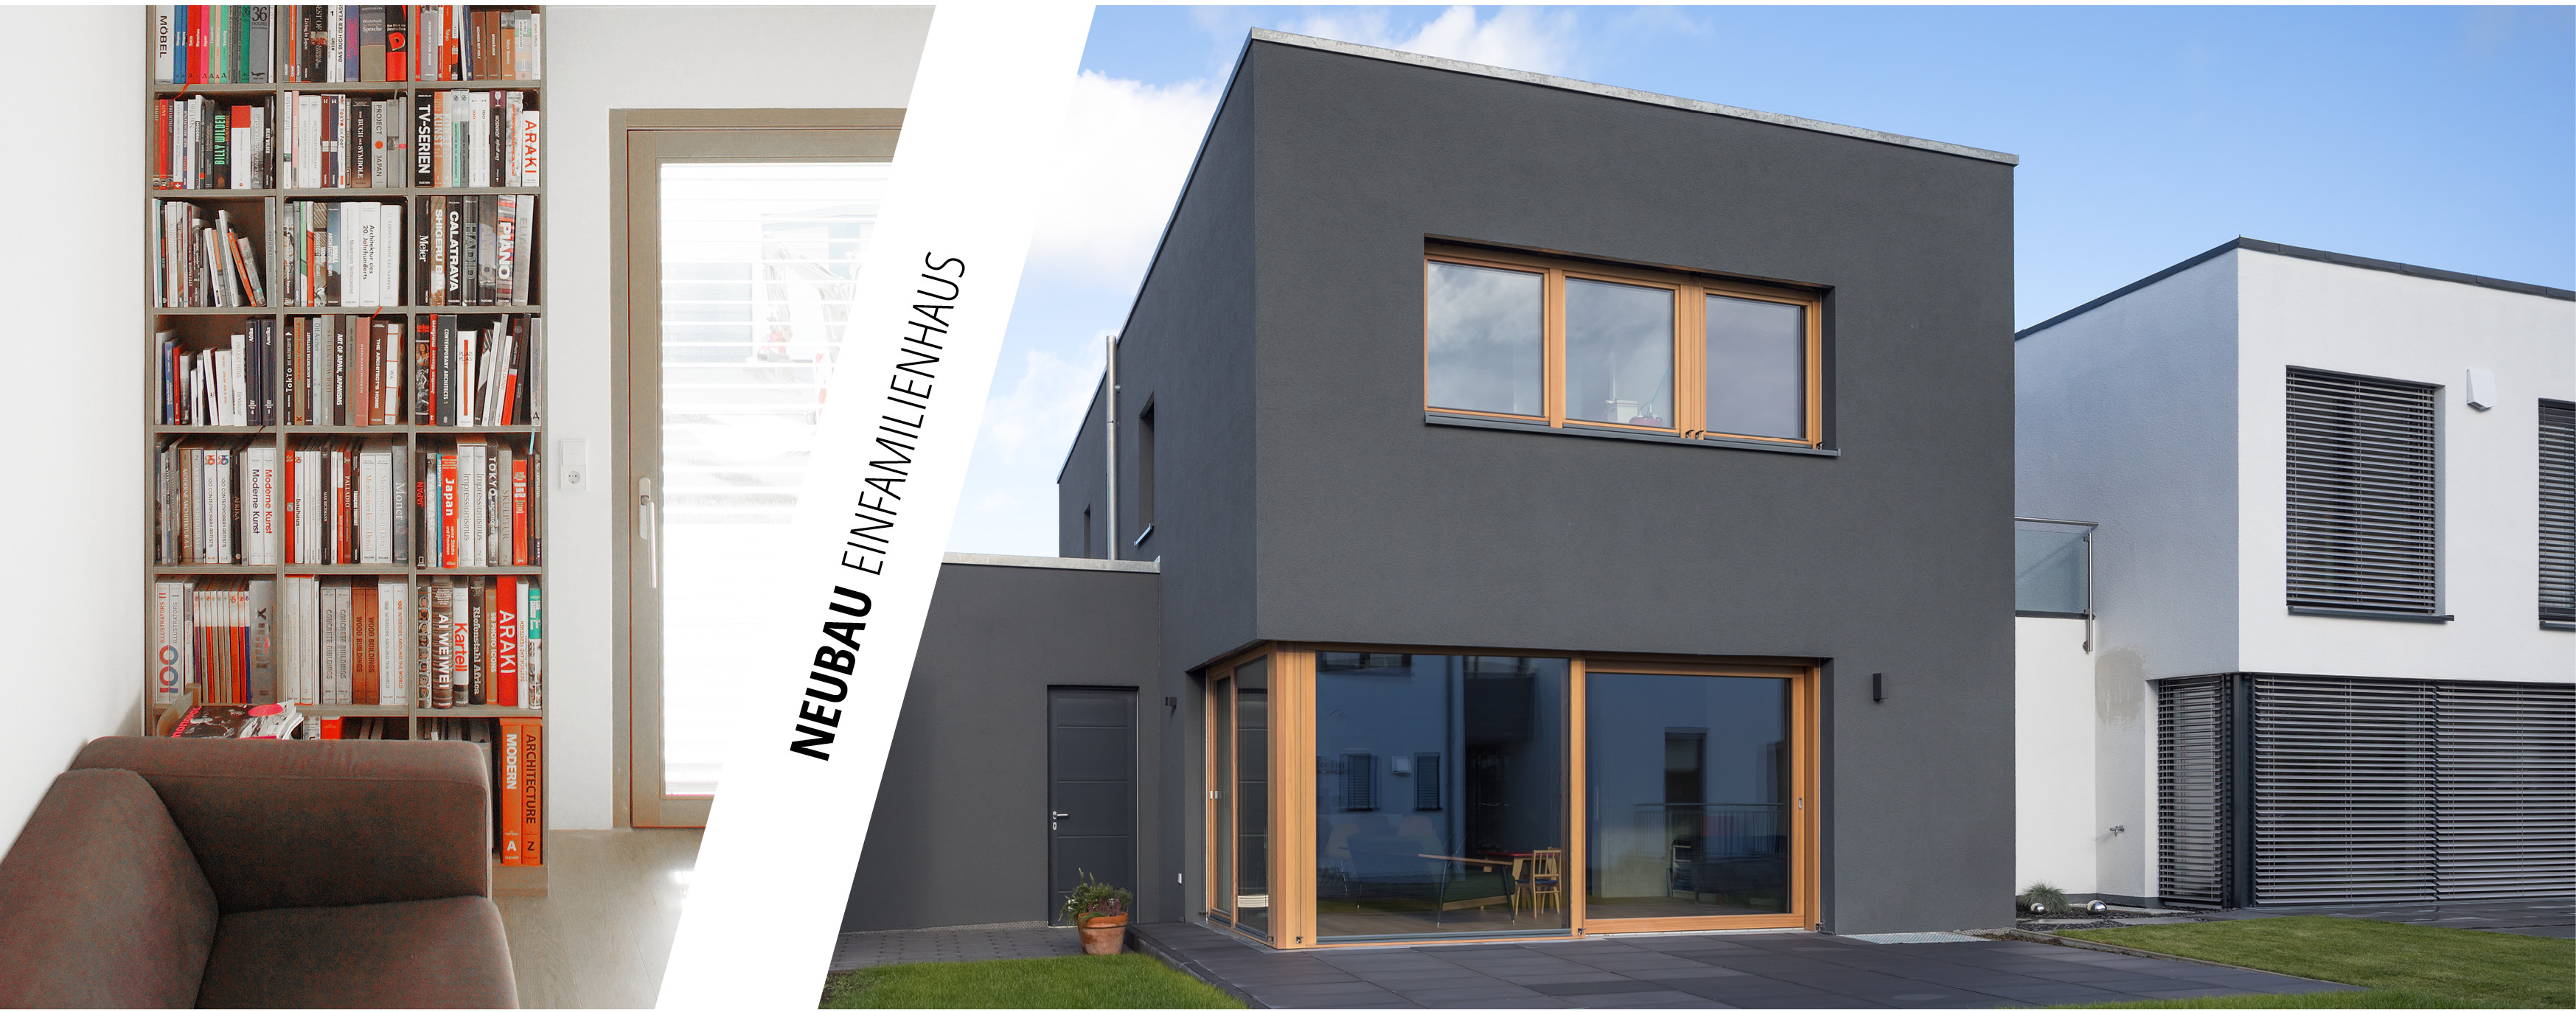 Architekten Ulm house in black einfamilienhaus in neu ulm rc studio carnevale